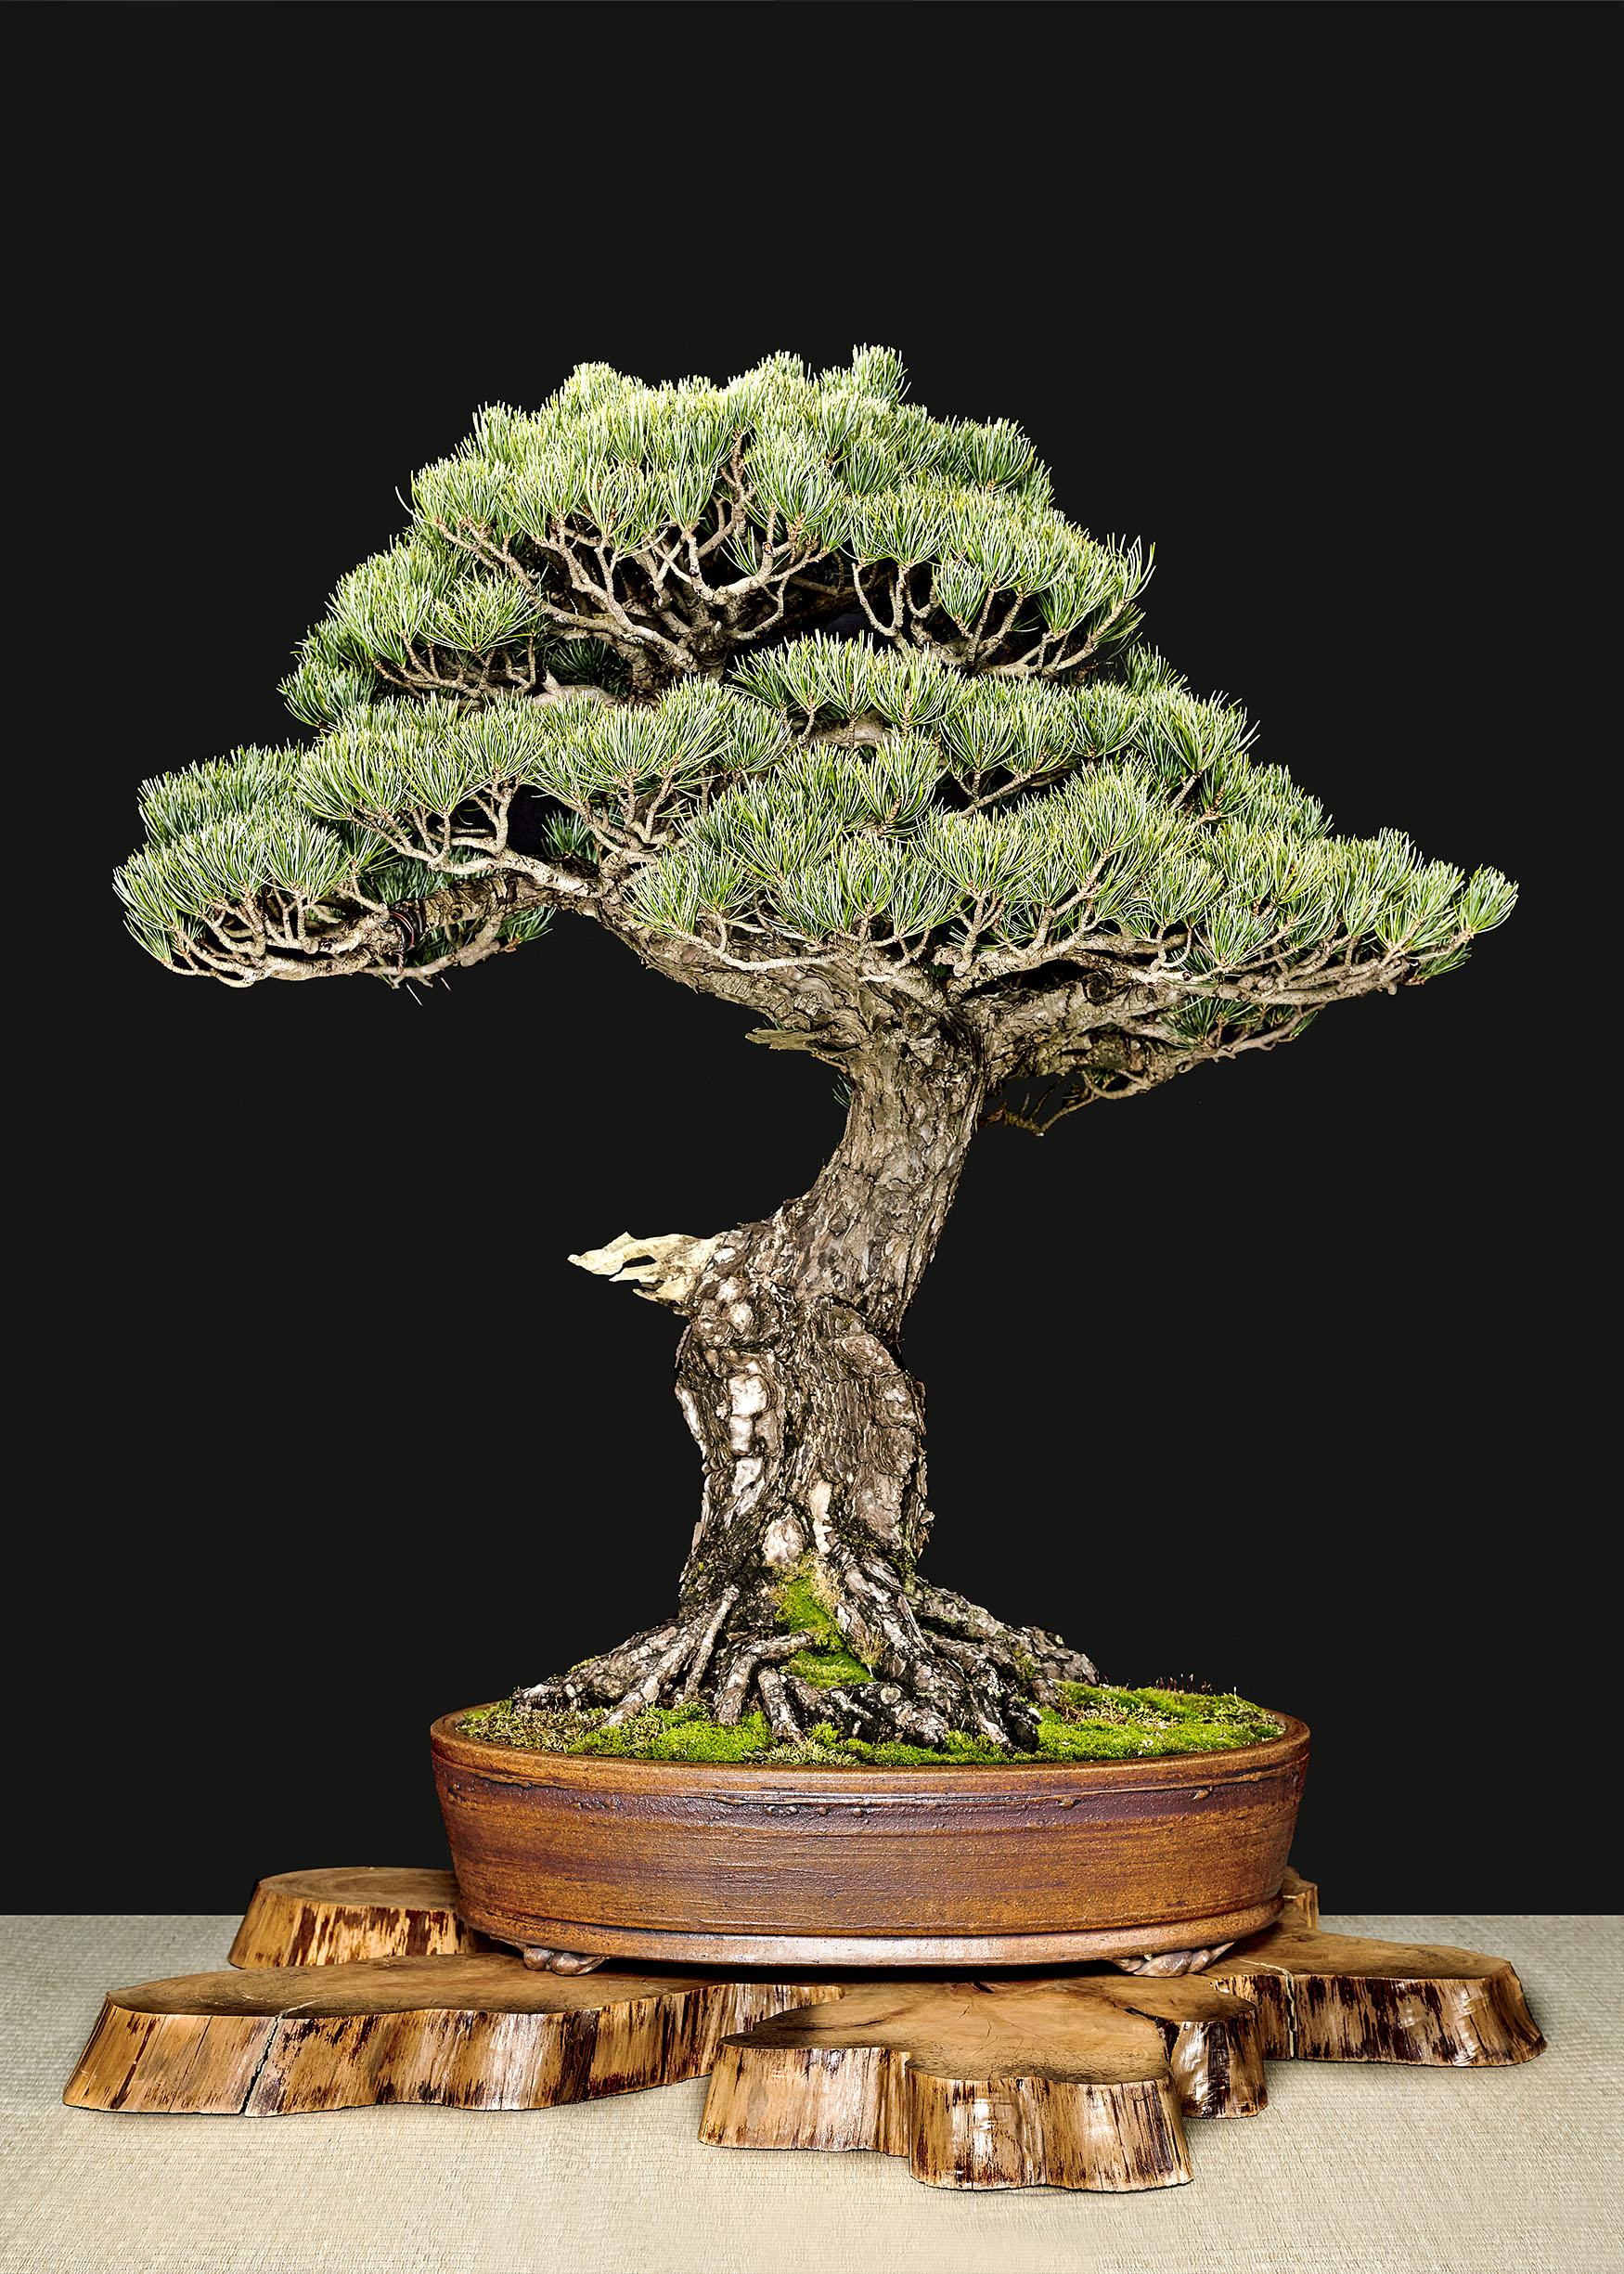 Japanese Black Pine: Pinus thunbergii